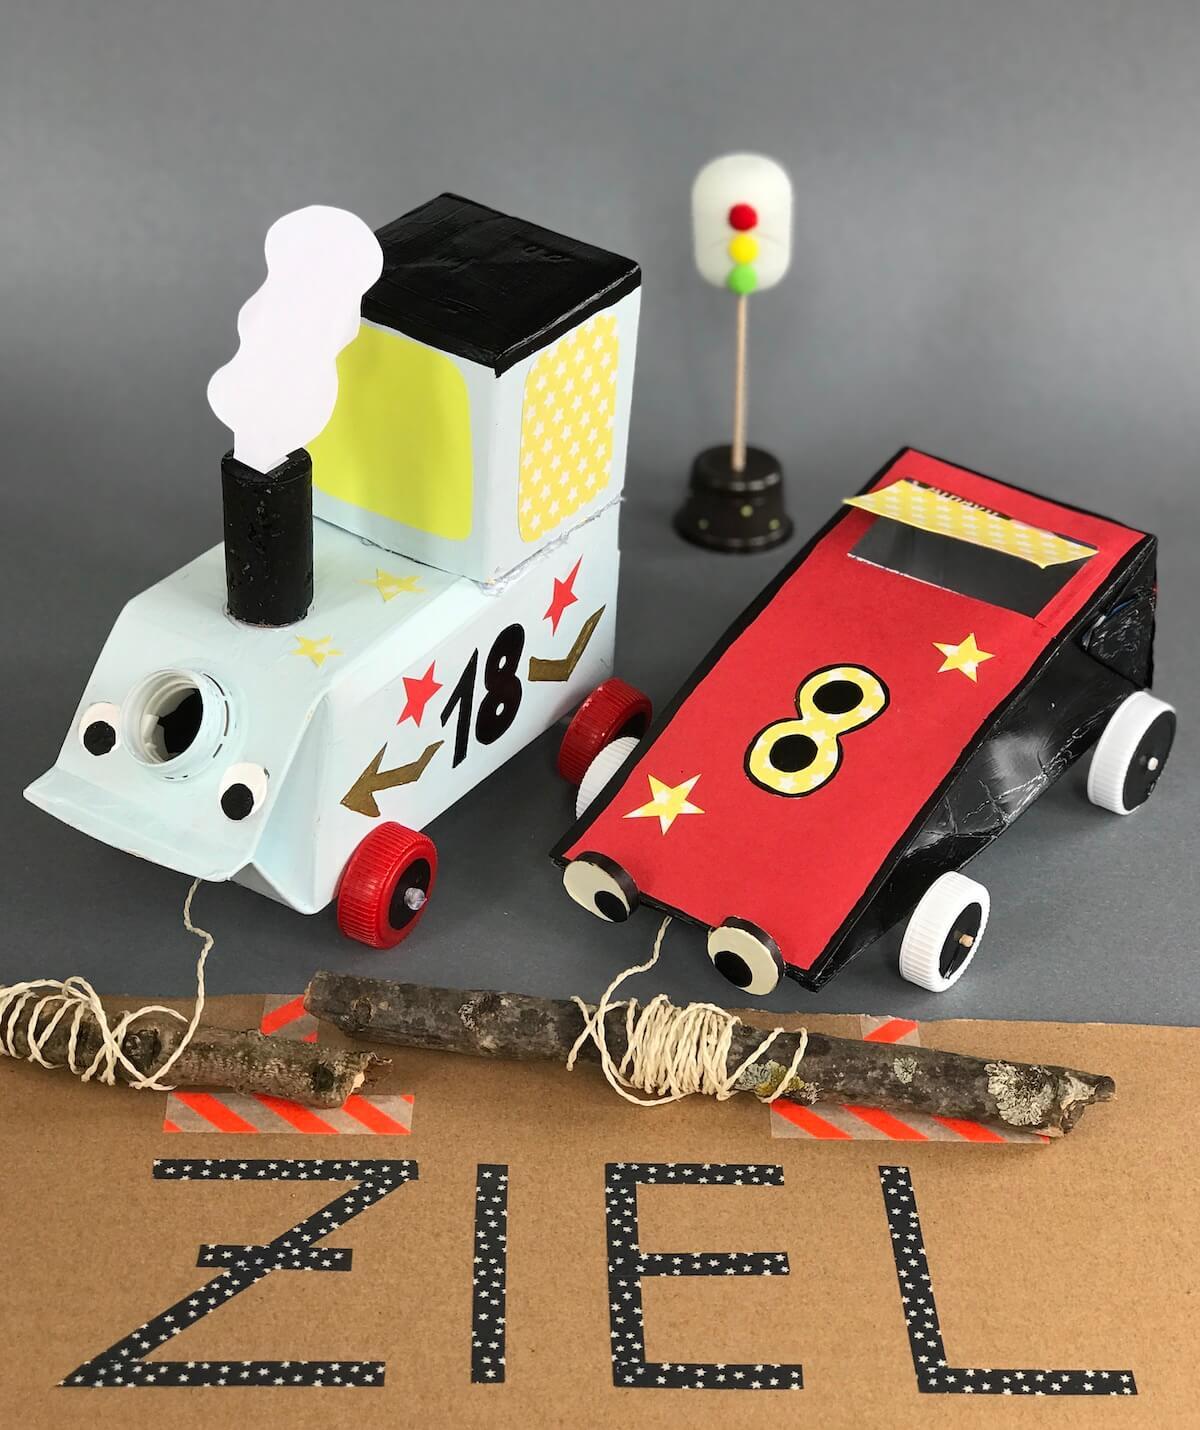 auto-basteln-spiel-idee-fuer-cars-mottoparty